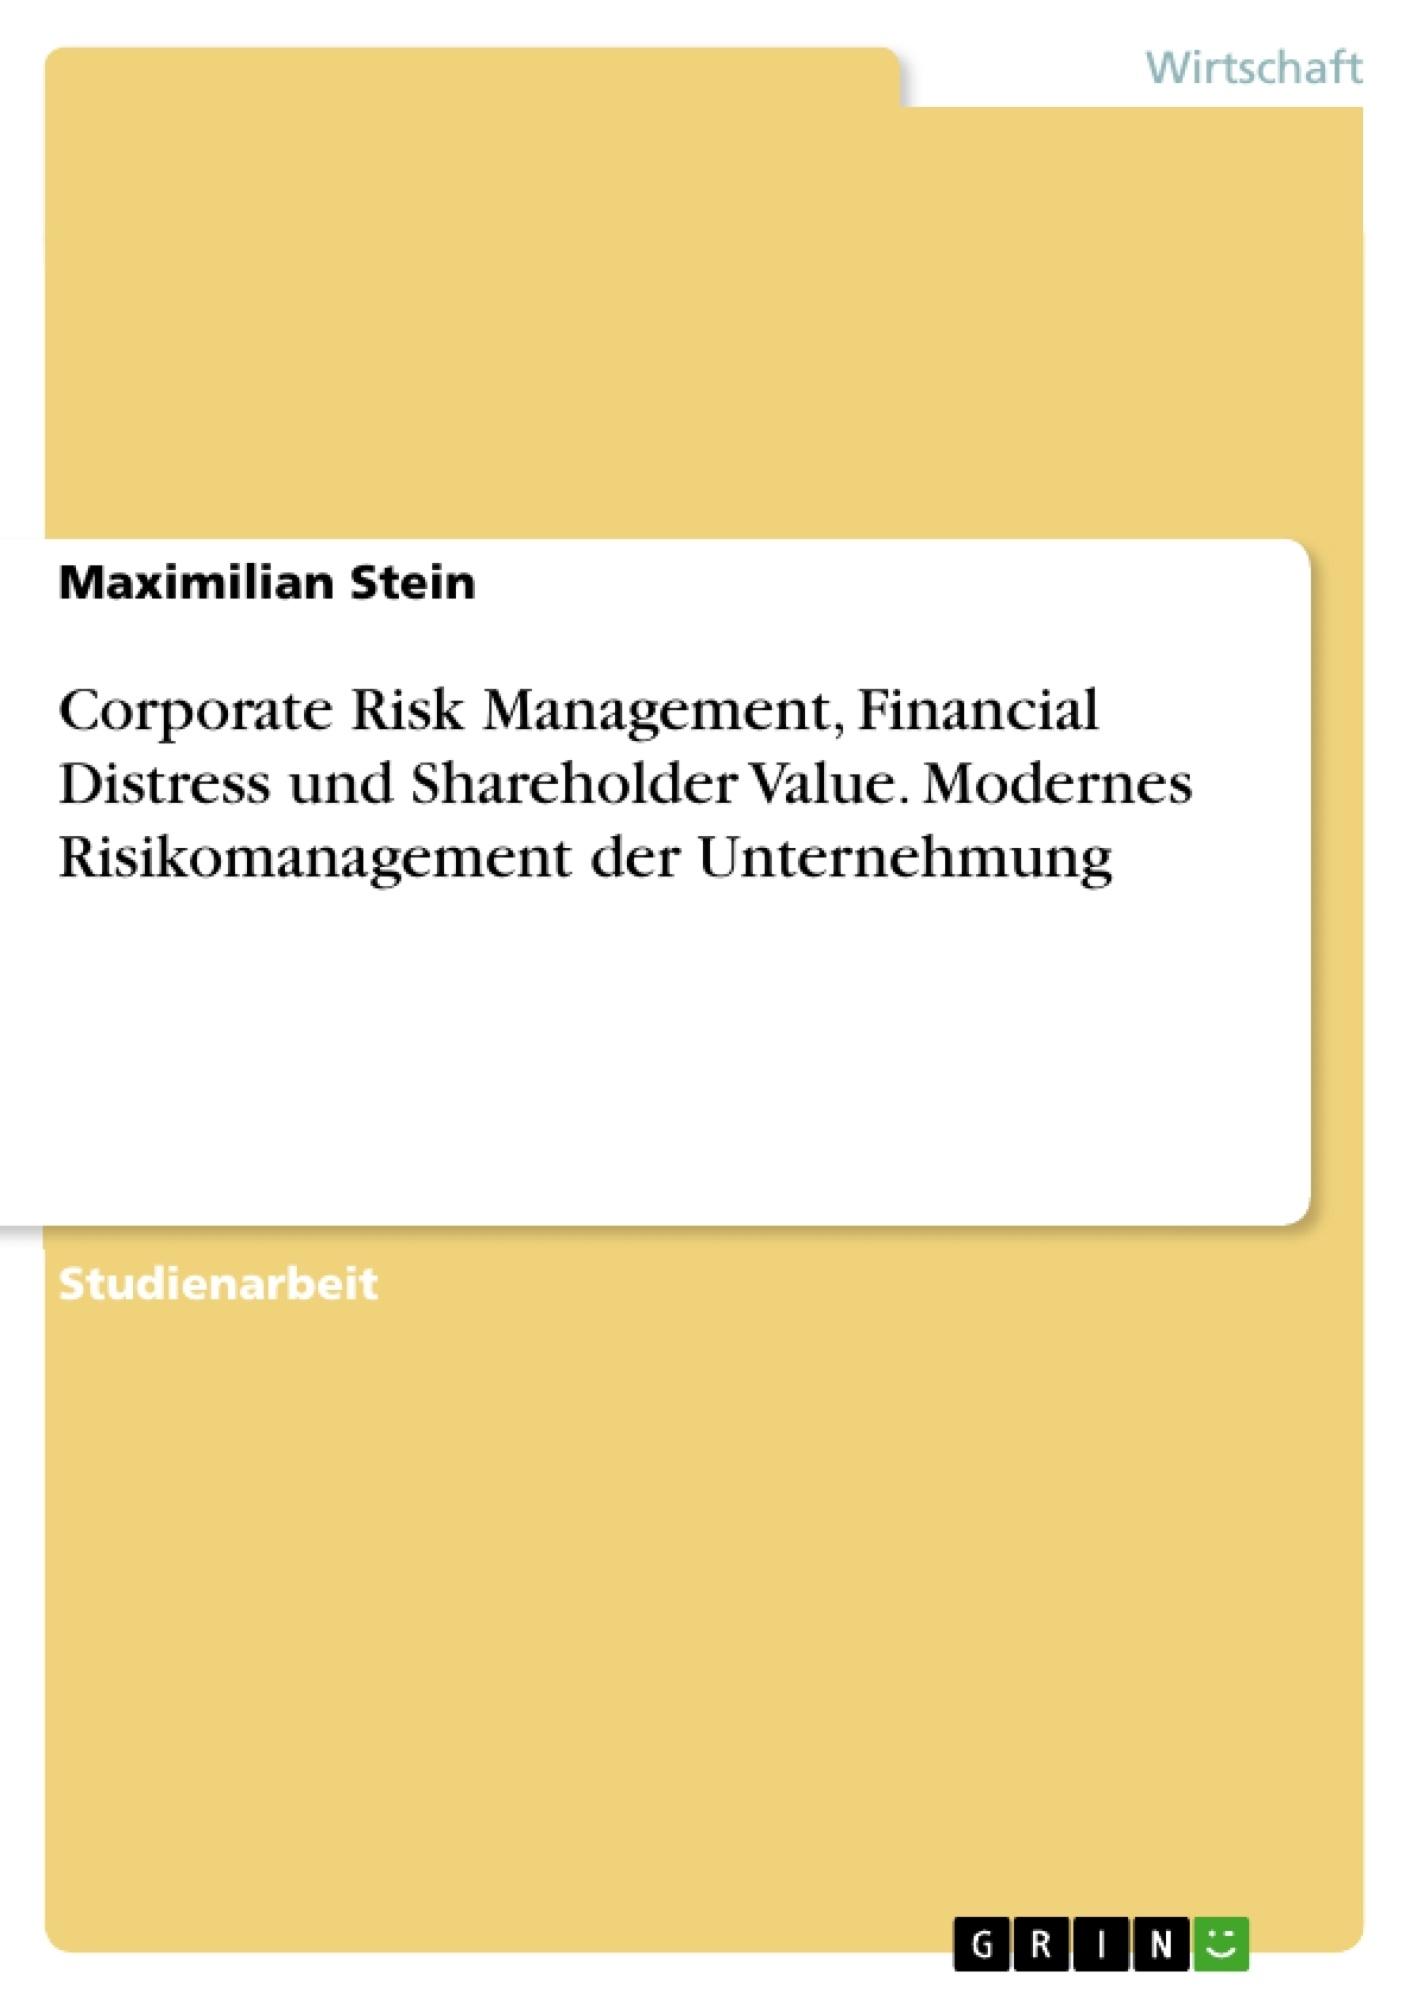 Titel: Corporate Risk Management, Financial Distress und Shareholder Value. Modernes Risikomanagement der Unternehmung